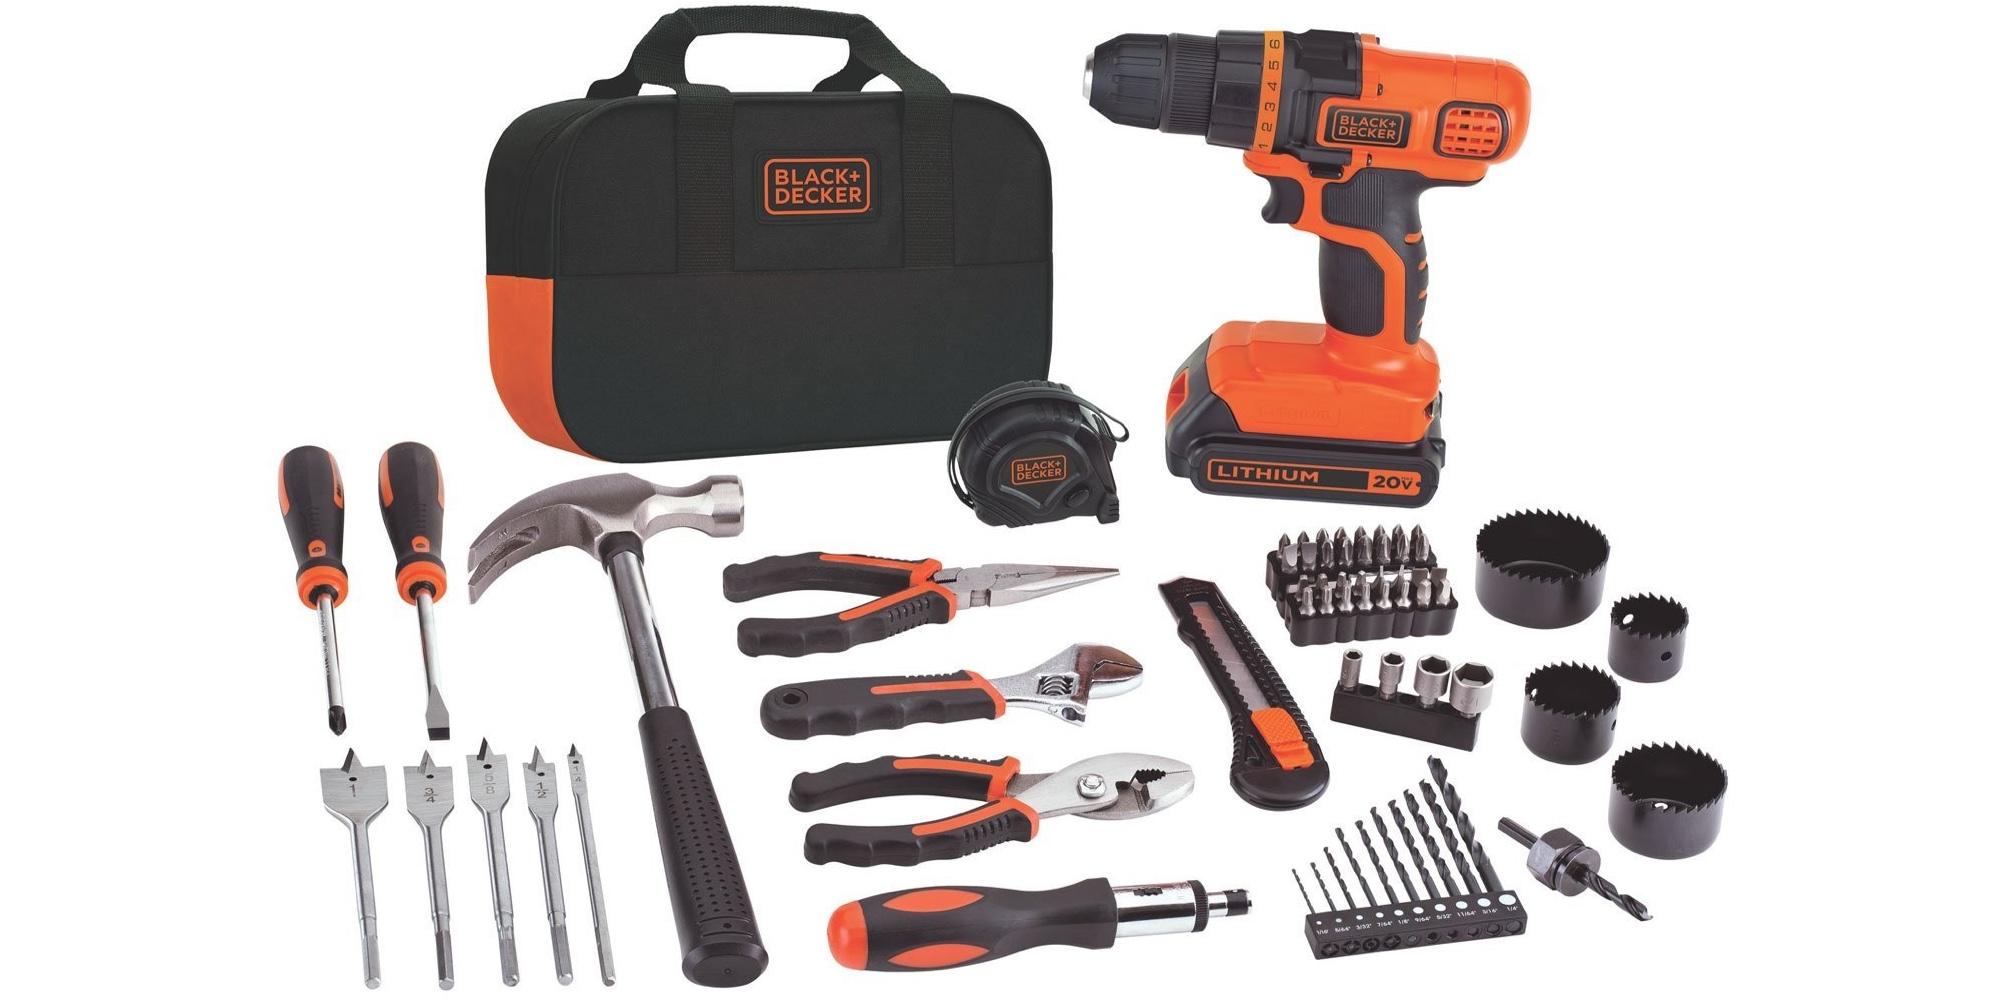 Black-decker-sale-discount-tools